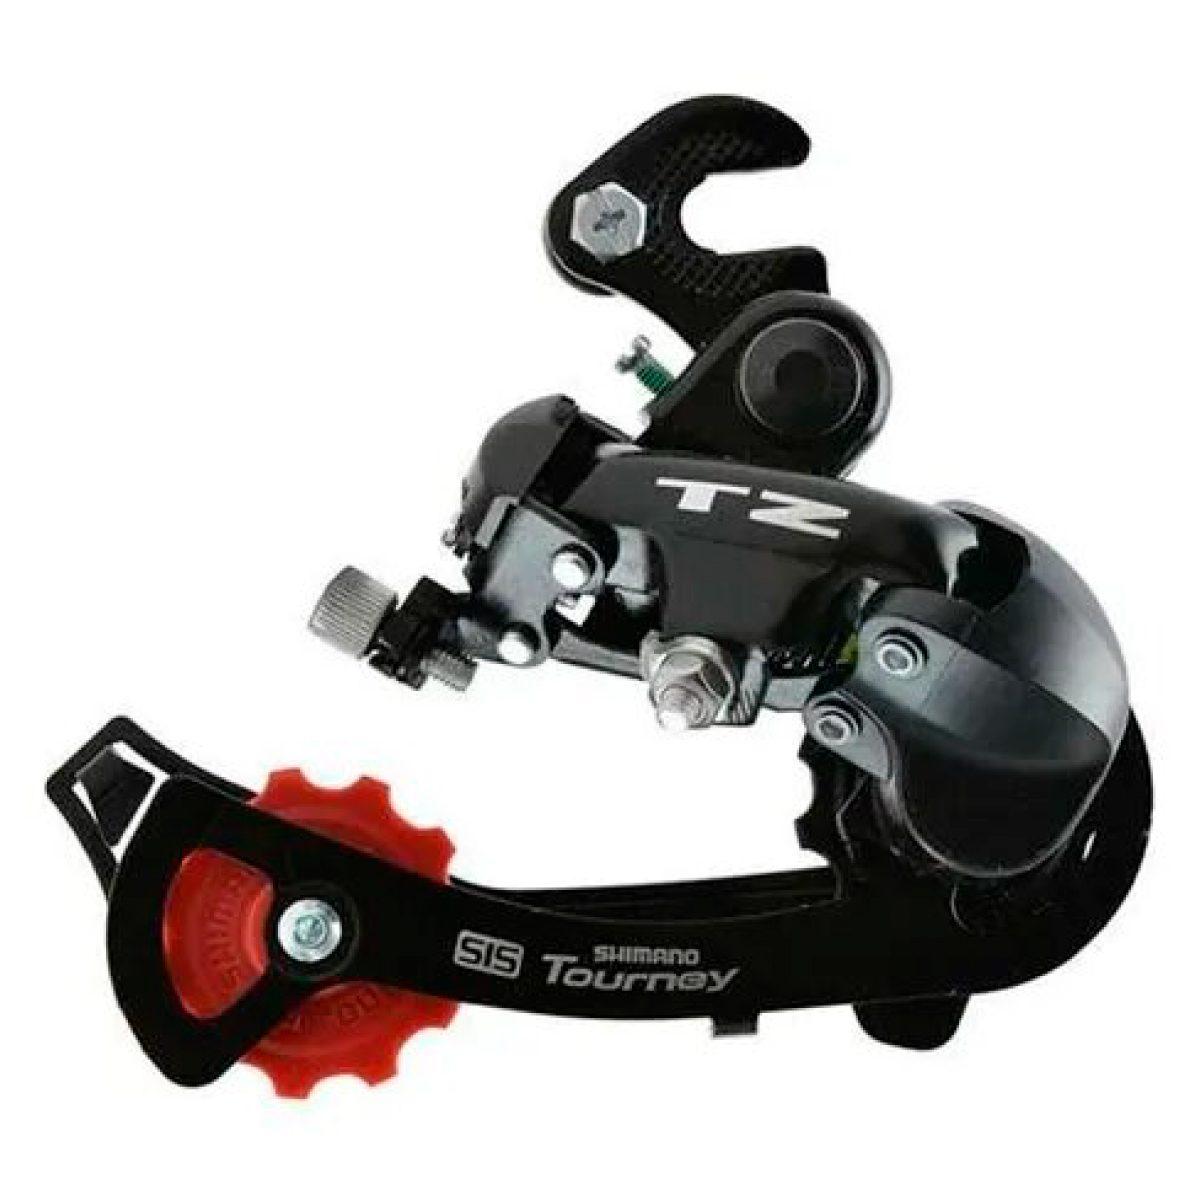 Cambio Traseiro Shimano Tourney RD-TZ500 6v Com Gancho